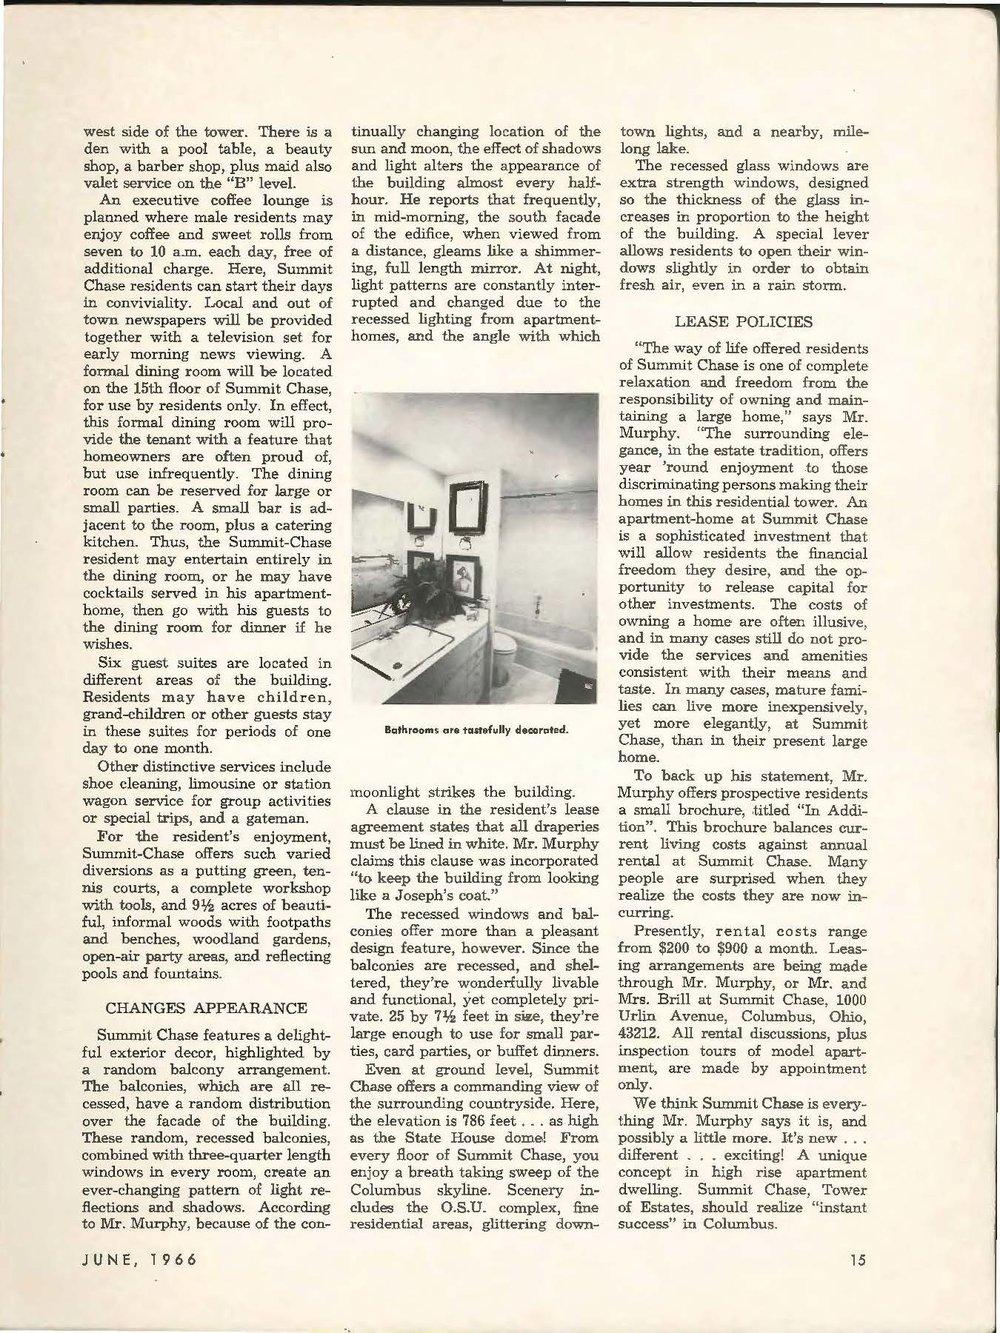 Skyline 1966_Page_15.jpg